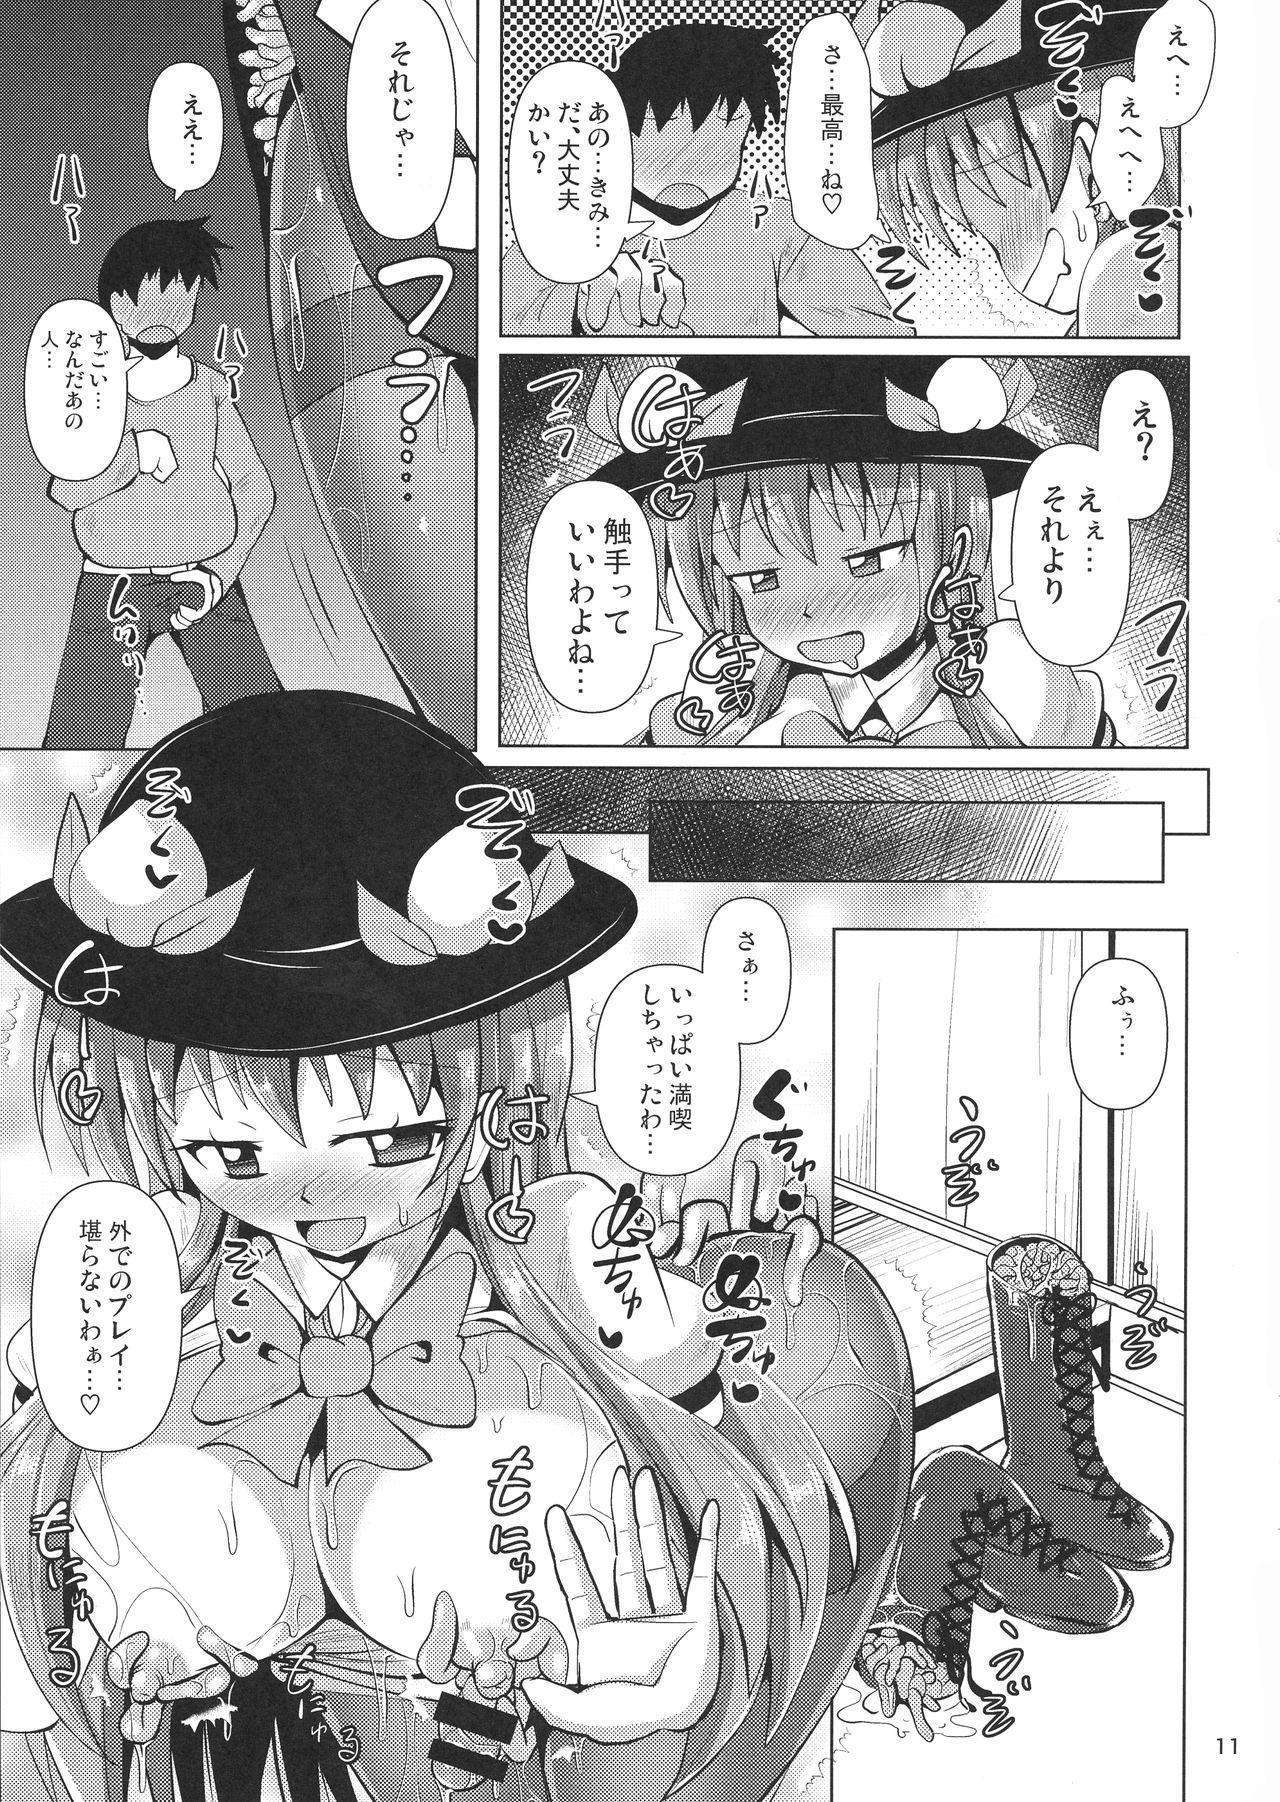 Futanari Tenshi Monogatari 3 10